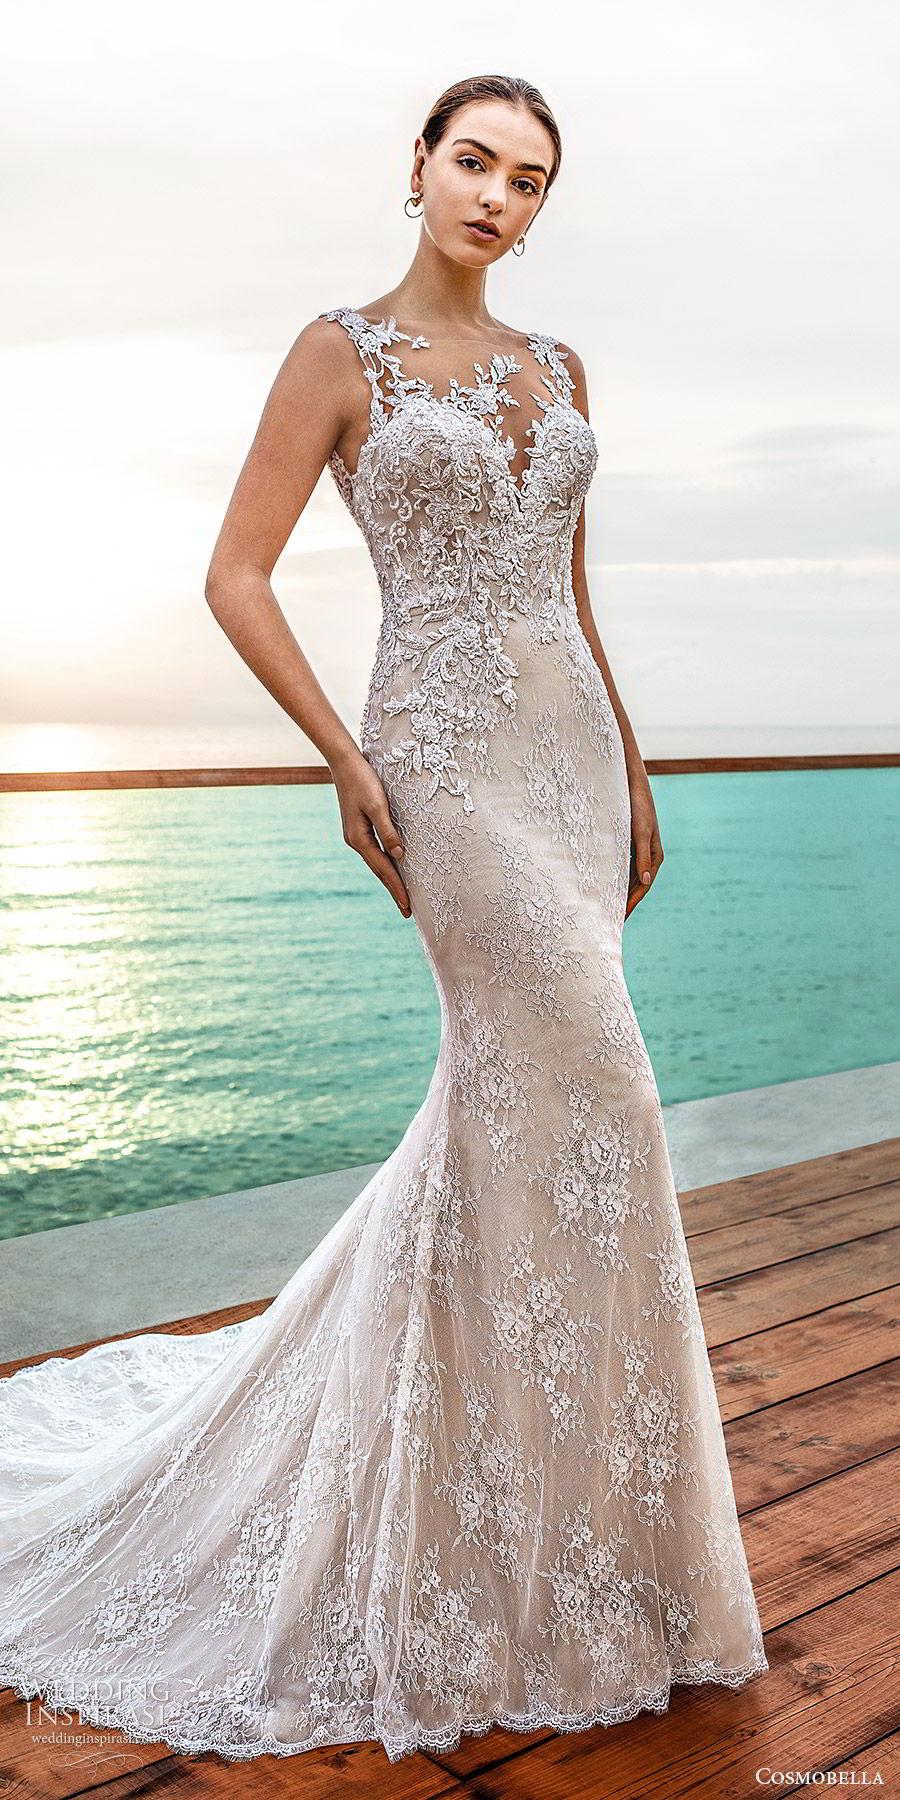 cosmobella 2020 bridal sleeveless illusion bateau neckline sweetheart fully embellished lace sheath wedding dress (7) elegant romantic low back chapel train mv